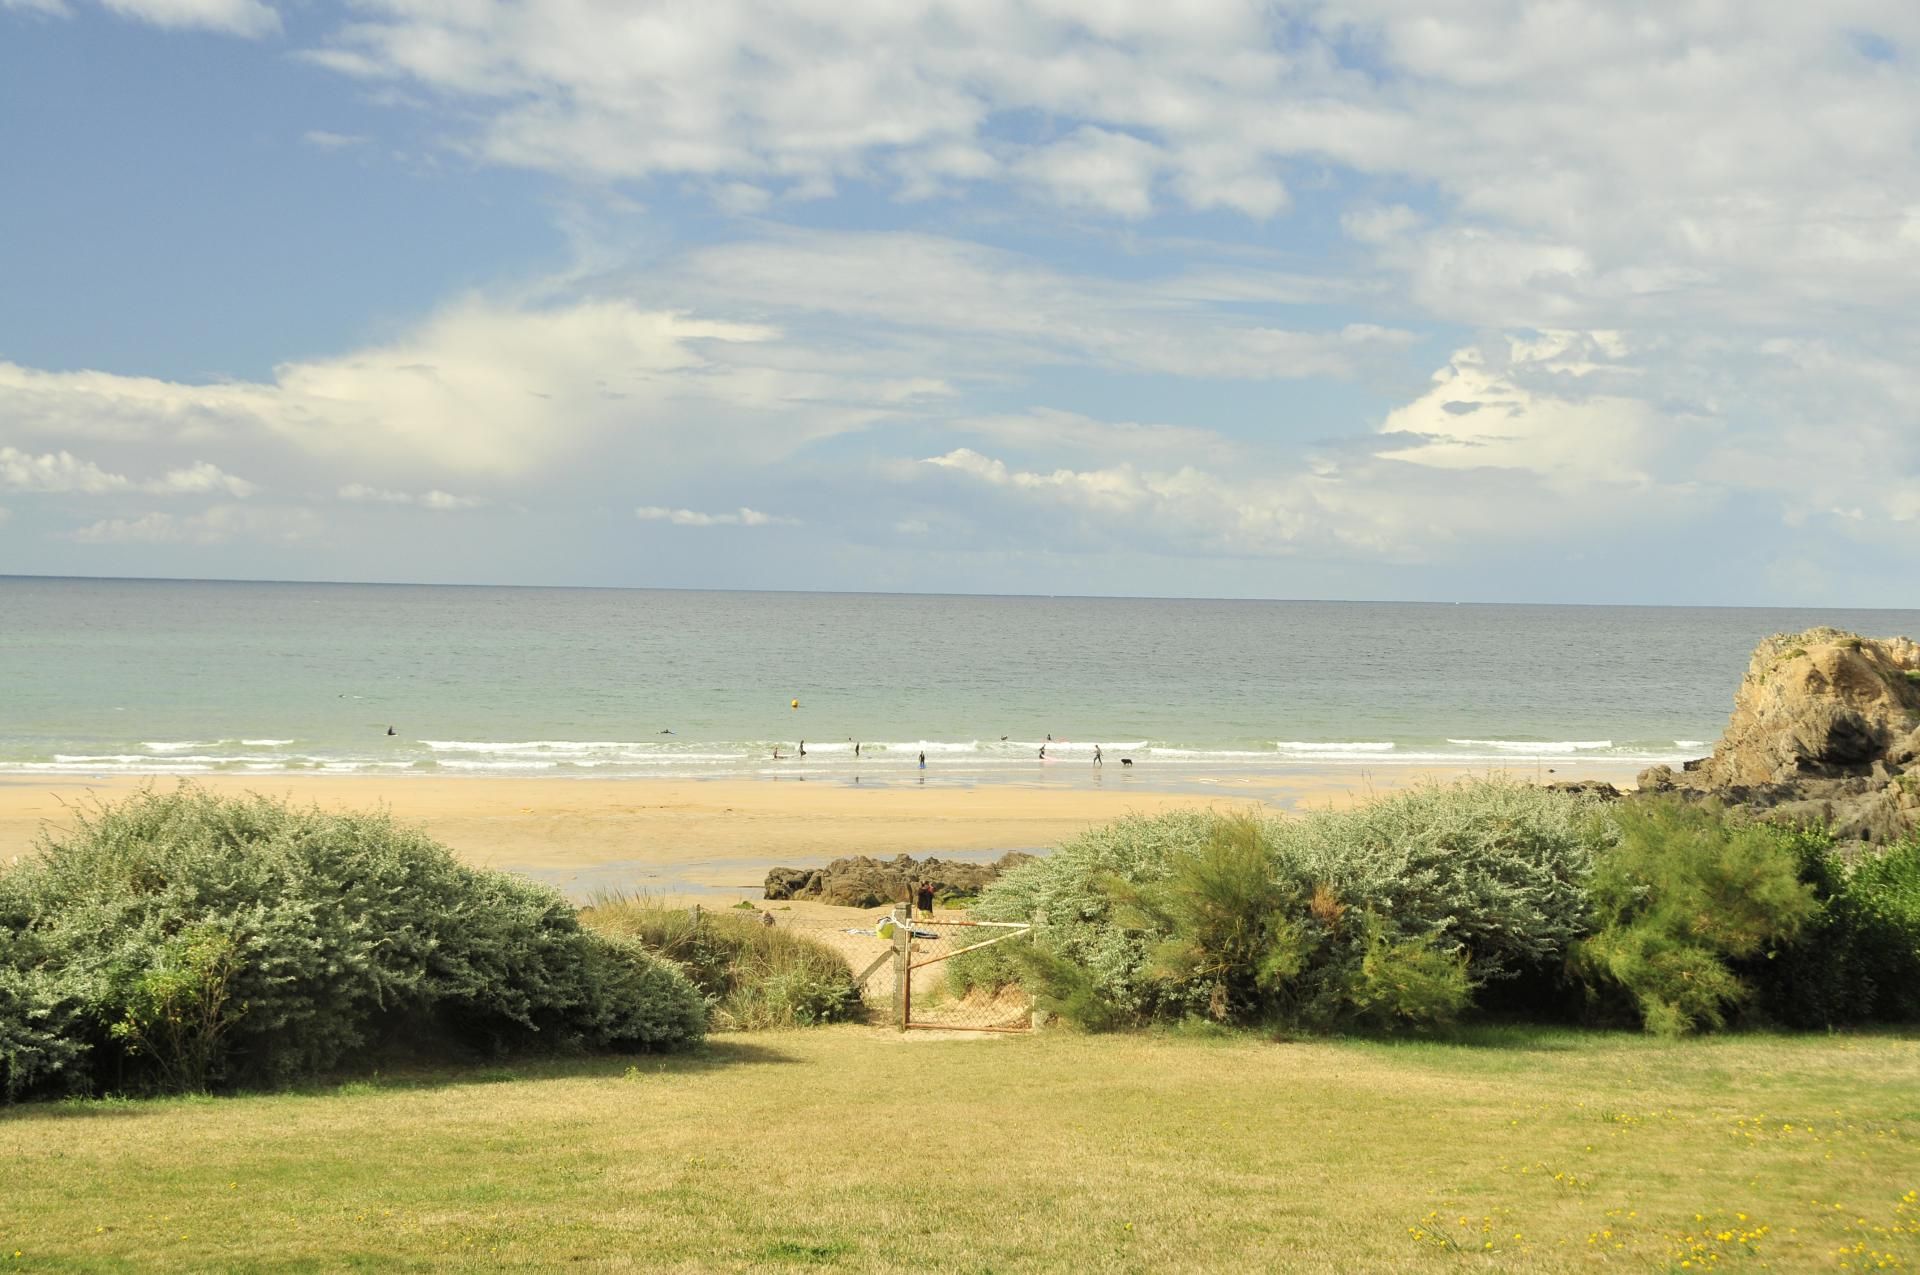 Villa Beach View, Cottage on the Beach, Le Pouldu, Brittany.